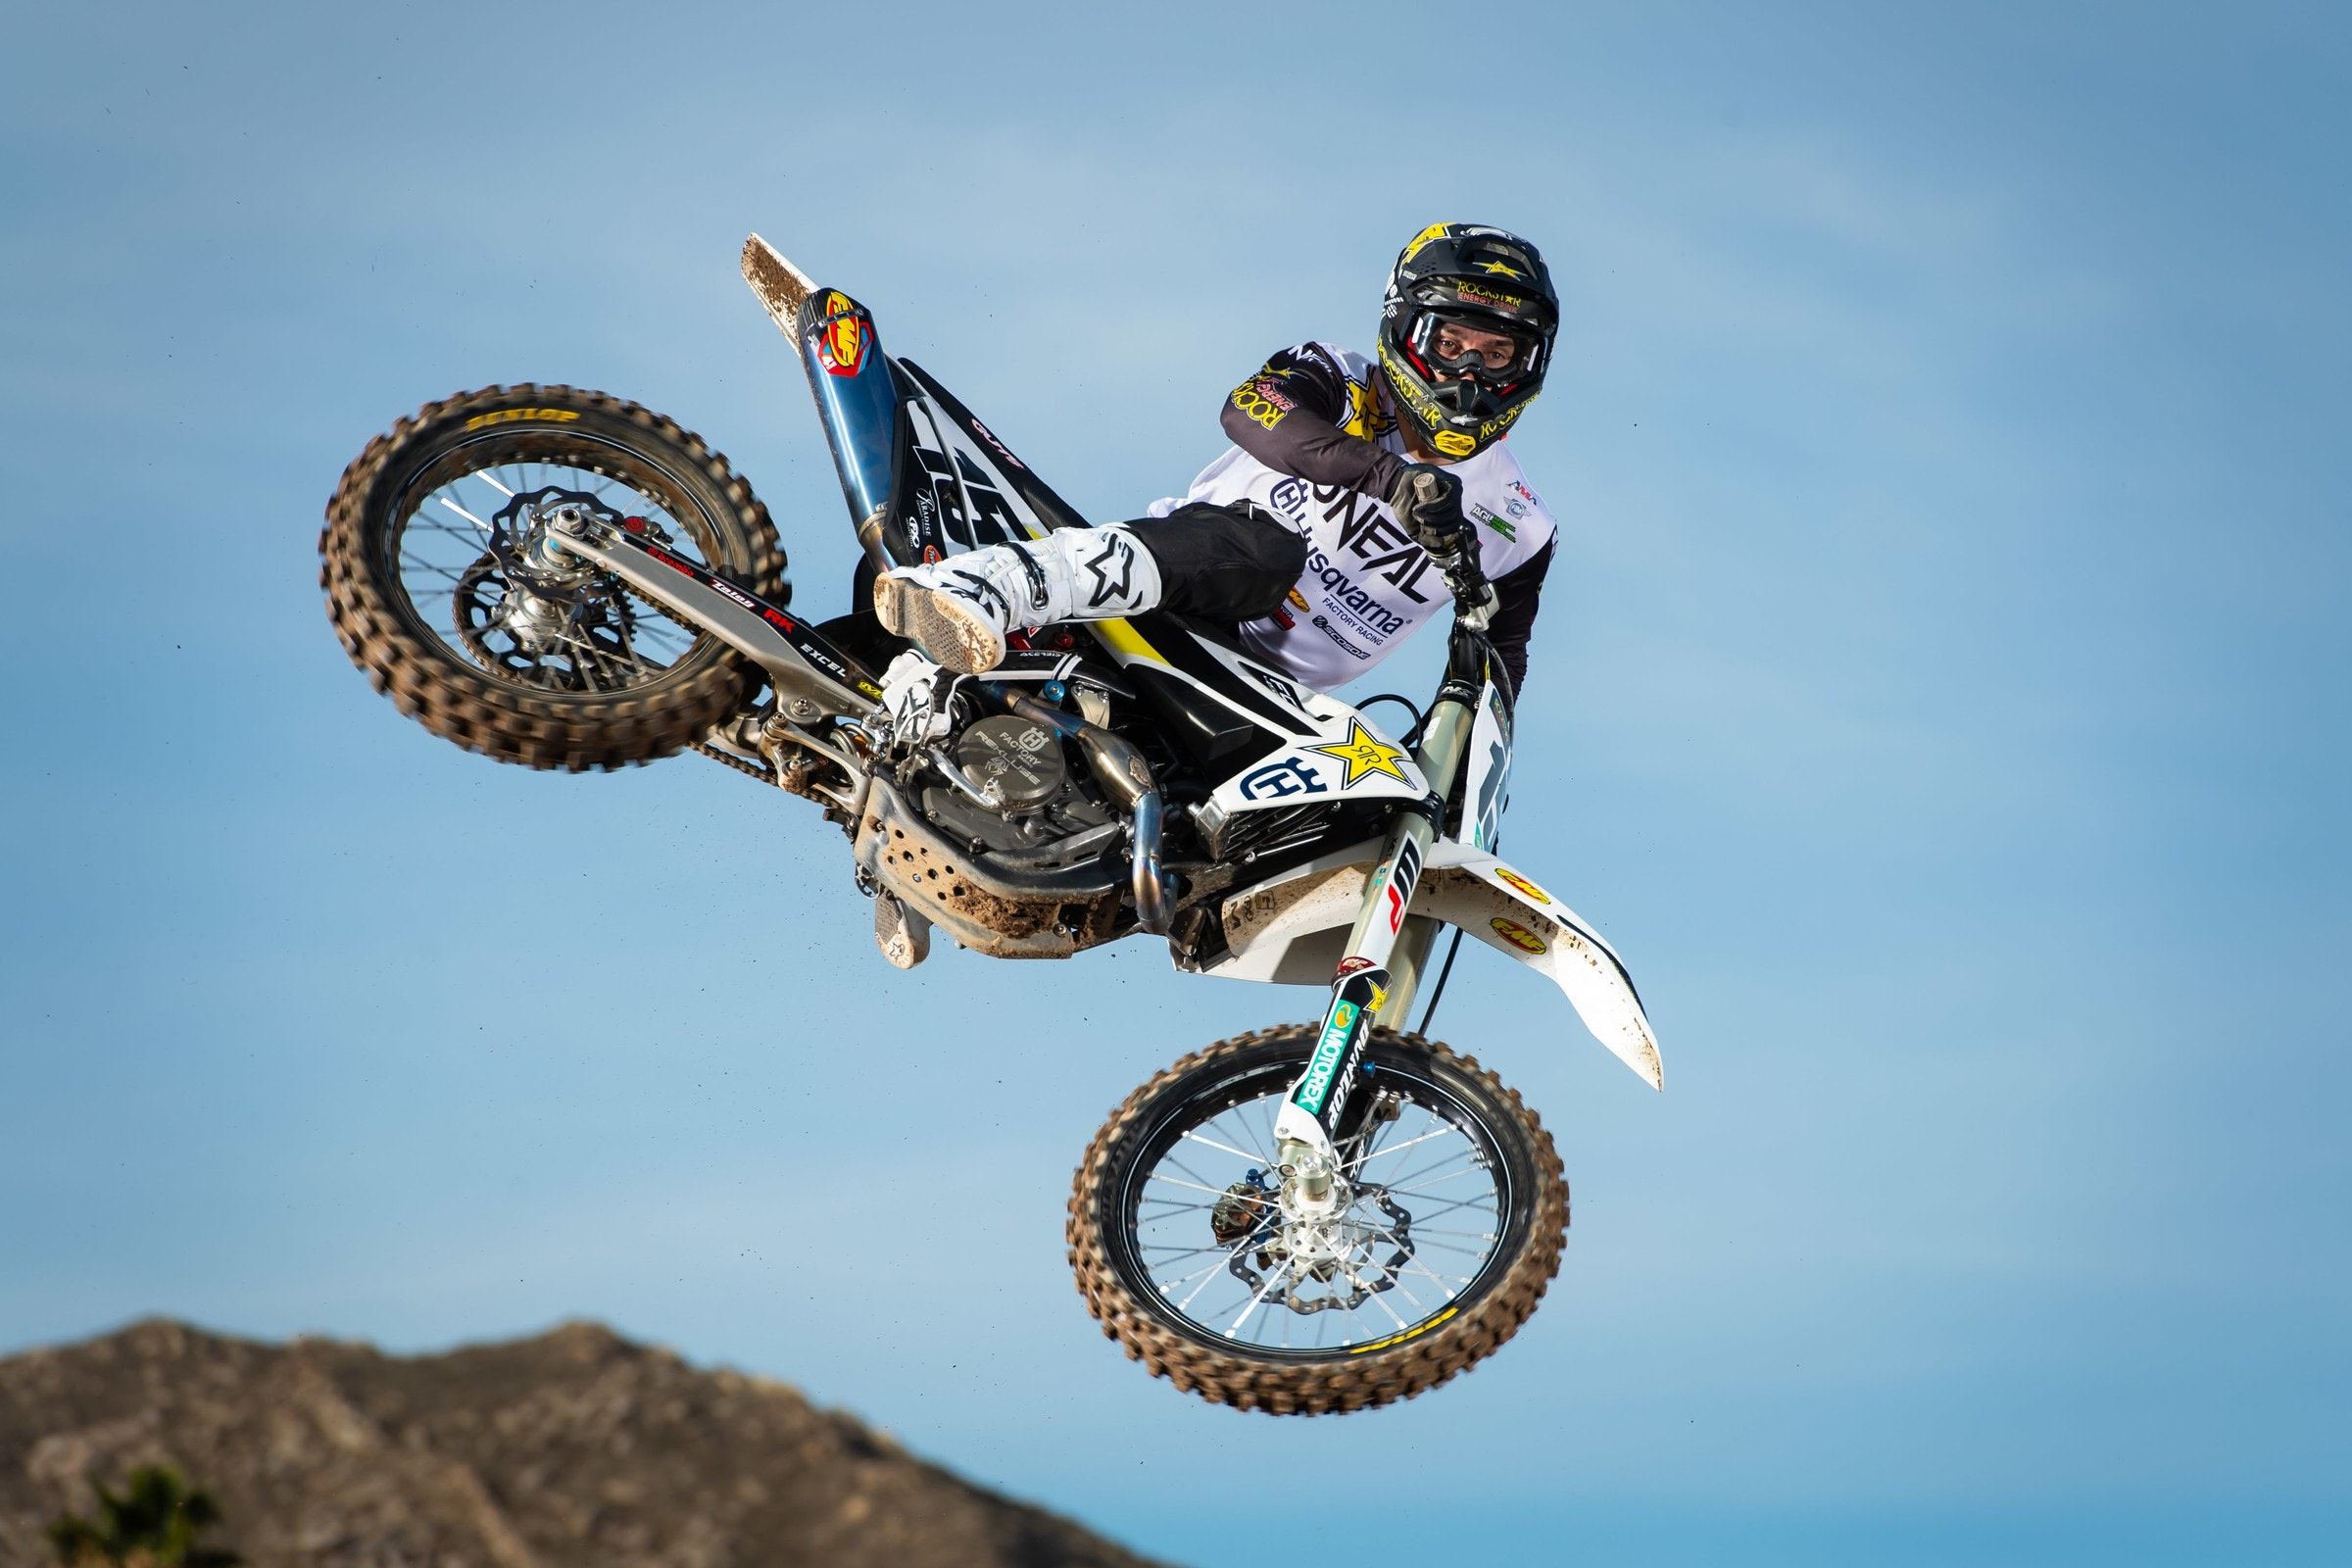 Dean Wilson Returns To Instagram Announces He Will Race 2020 Anaheim 1 Supercross Racer X Online